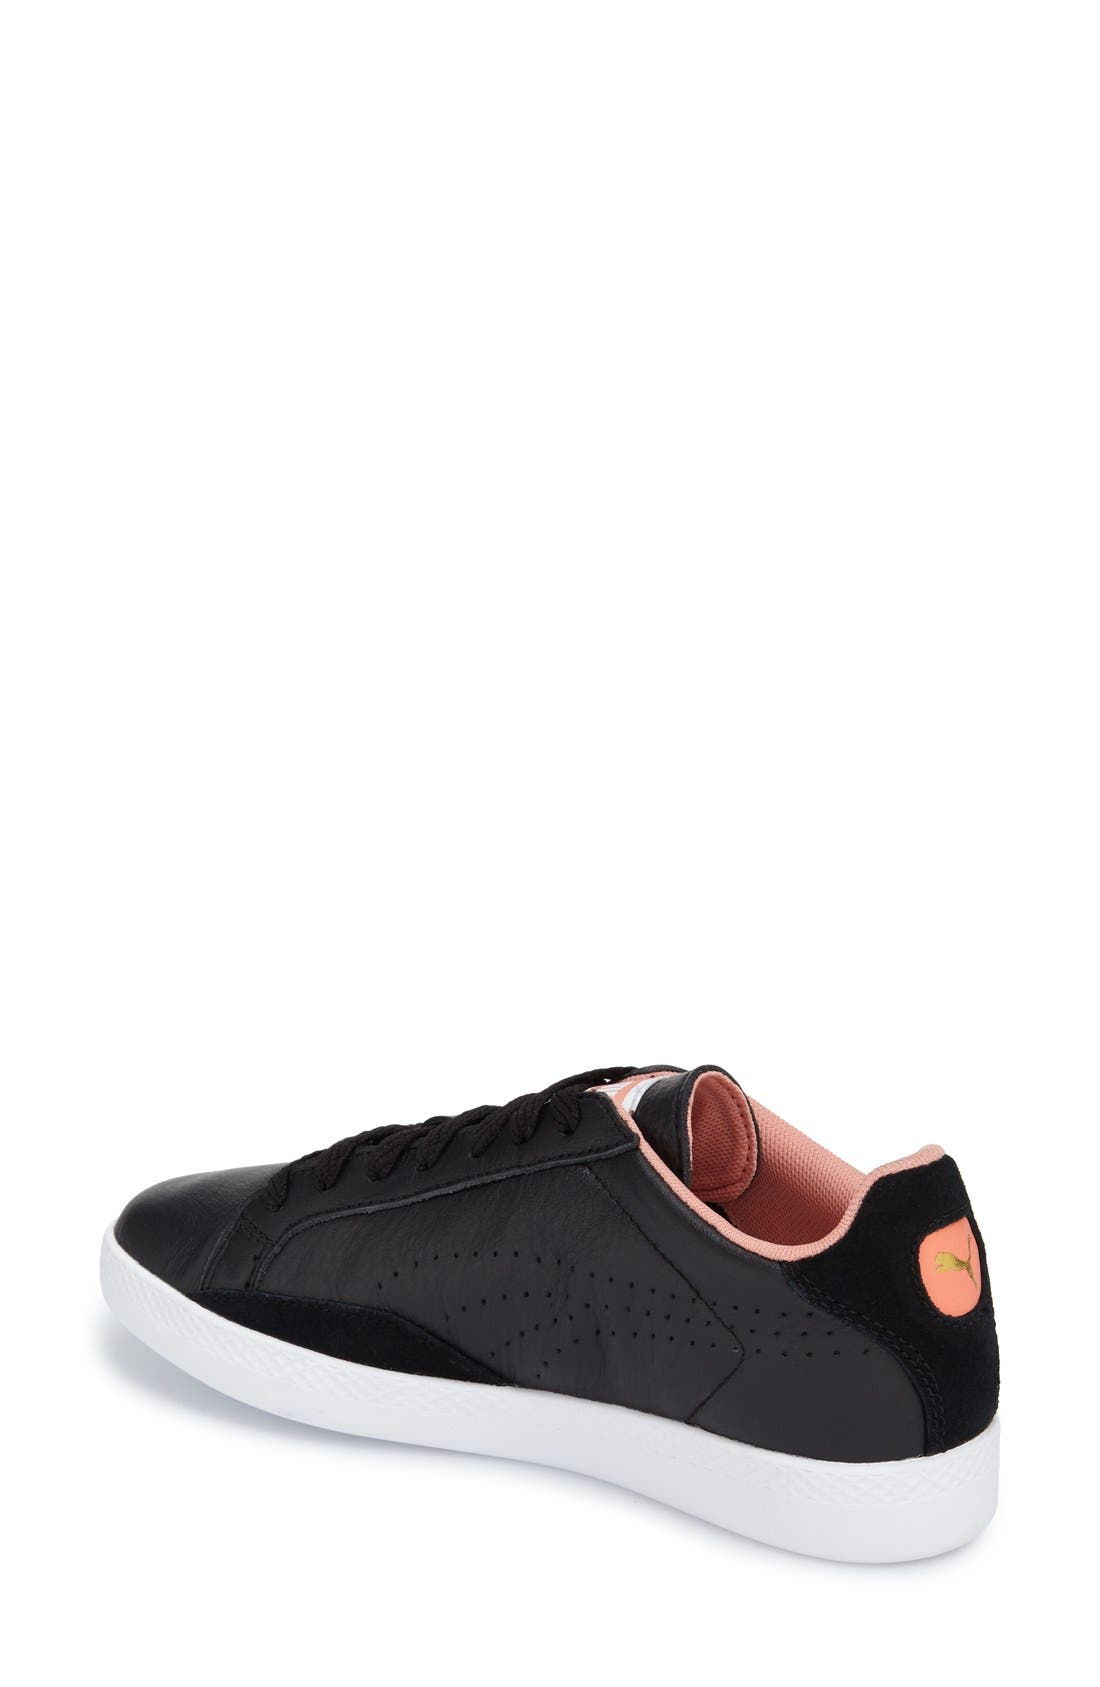 Alternate Image 2  - PUMA 'Match Lo - Basic Sport' Leather Sneaker (Women)